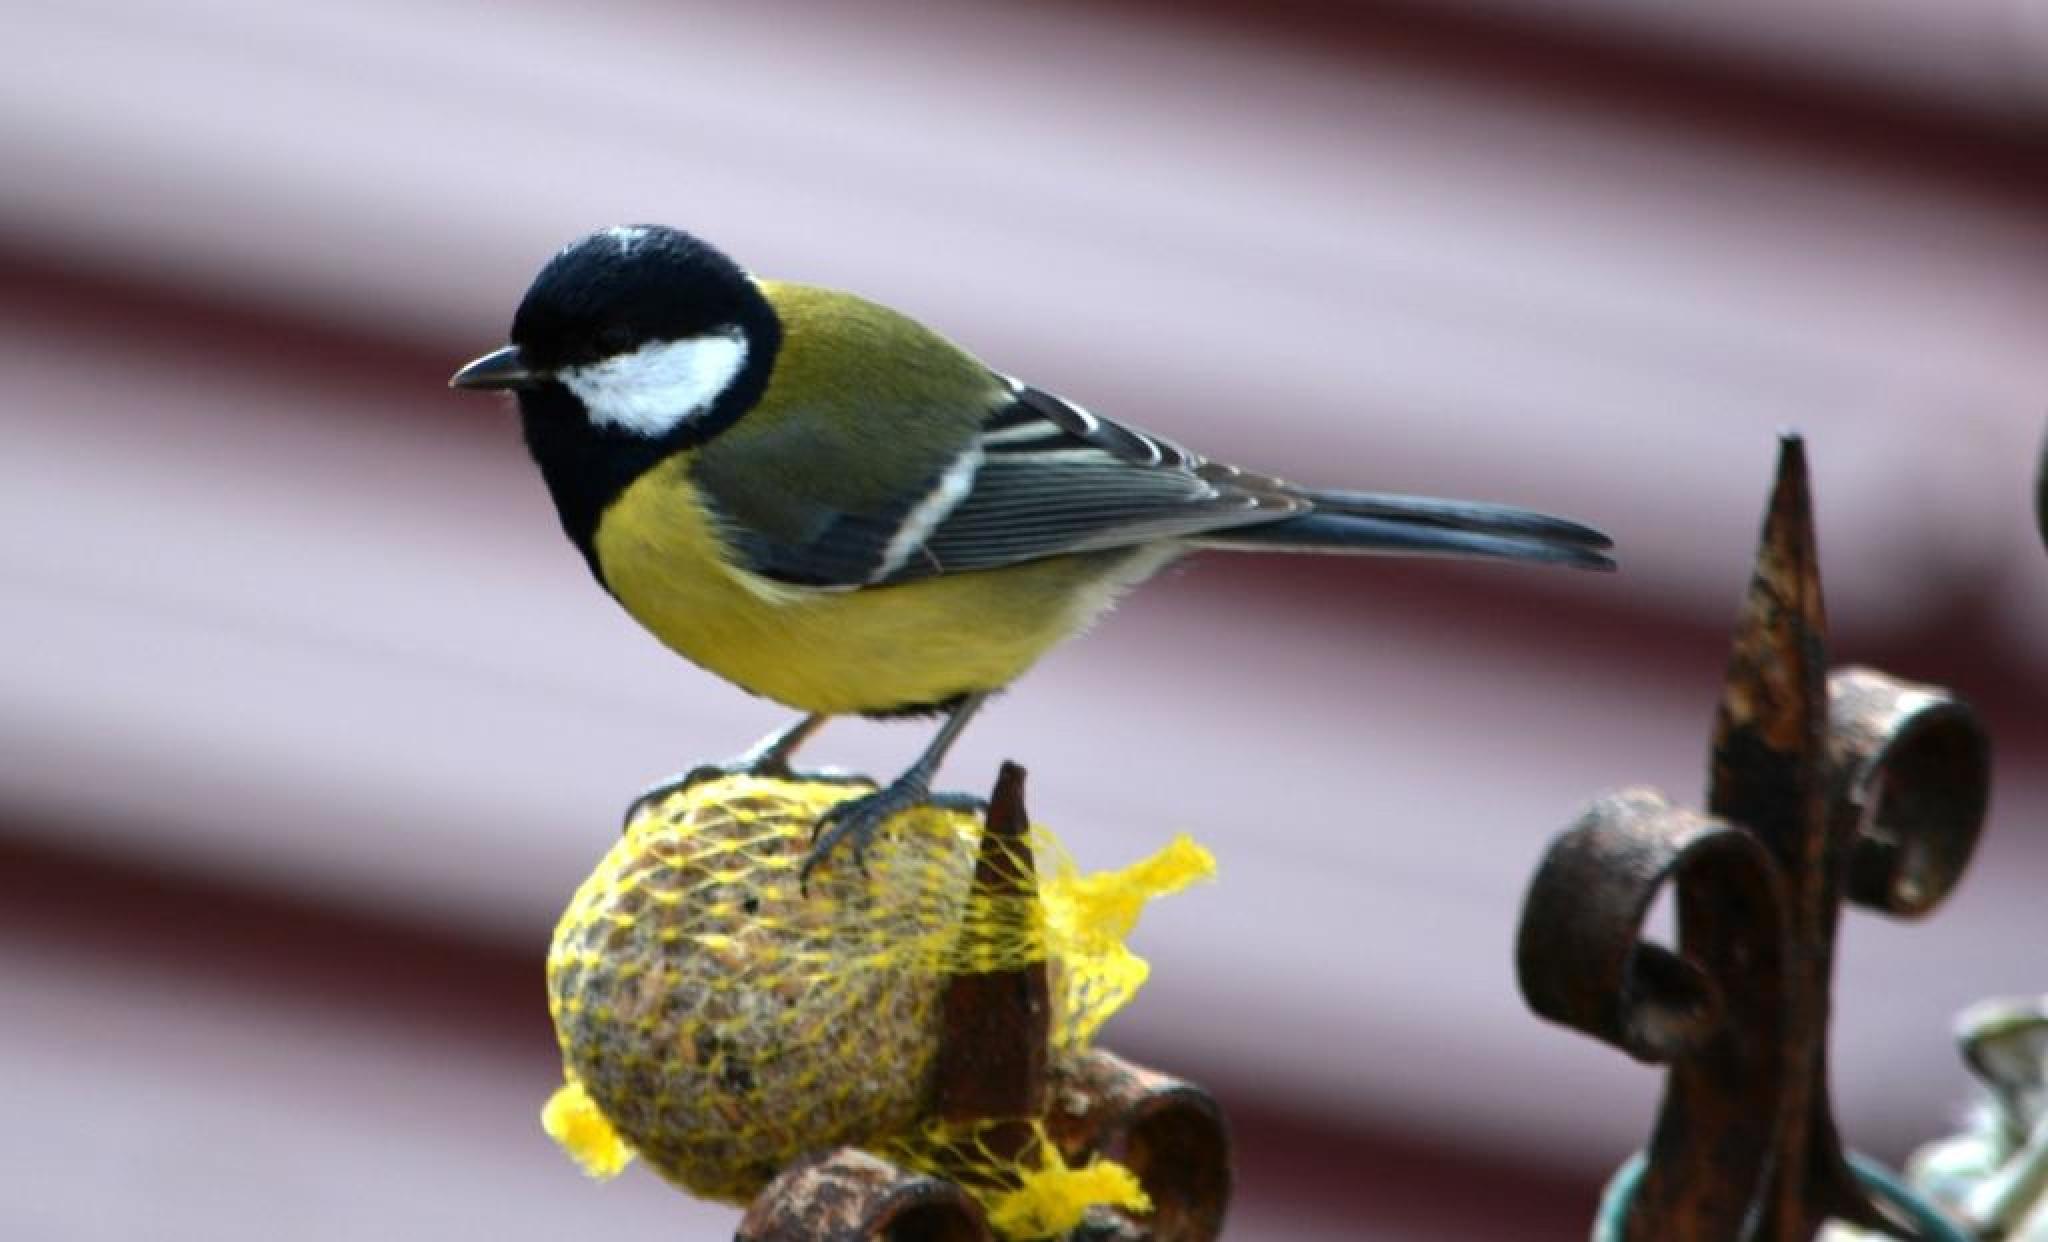 Feeding the wild birds by alison16